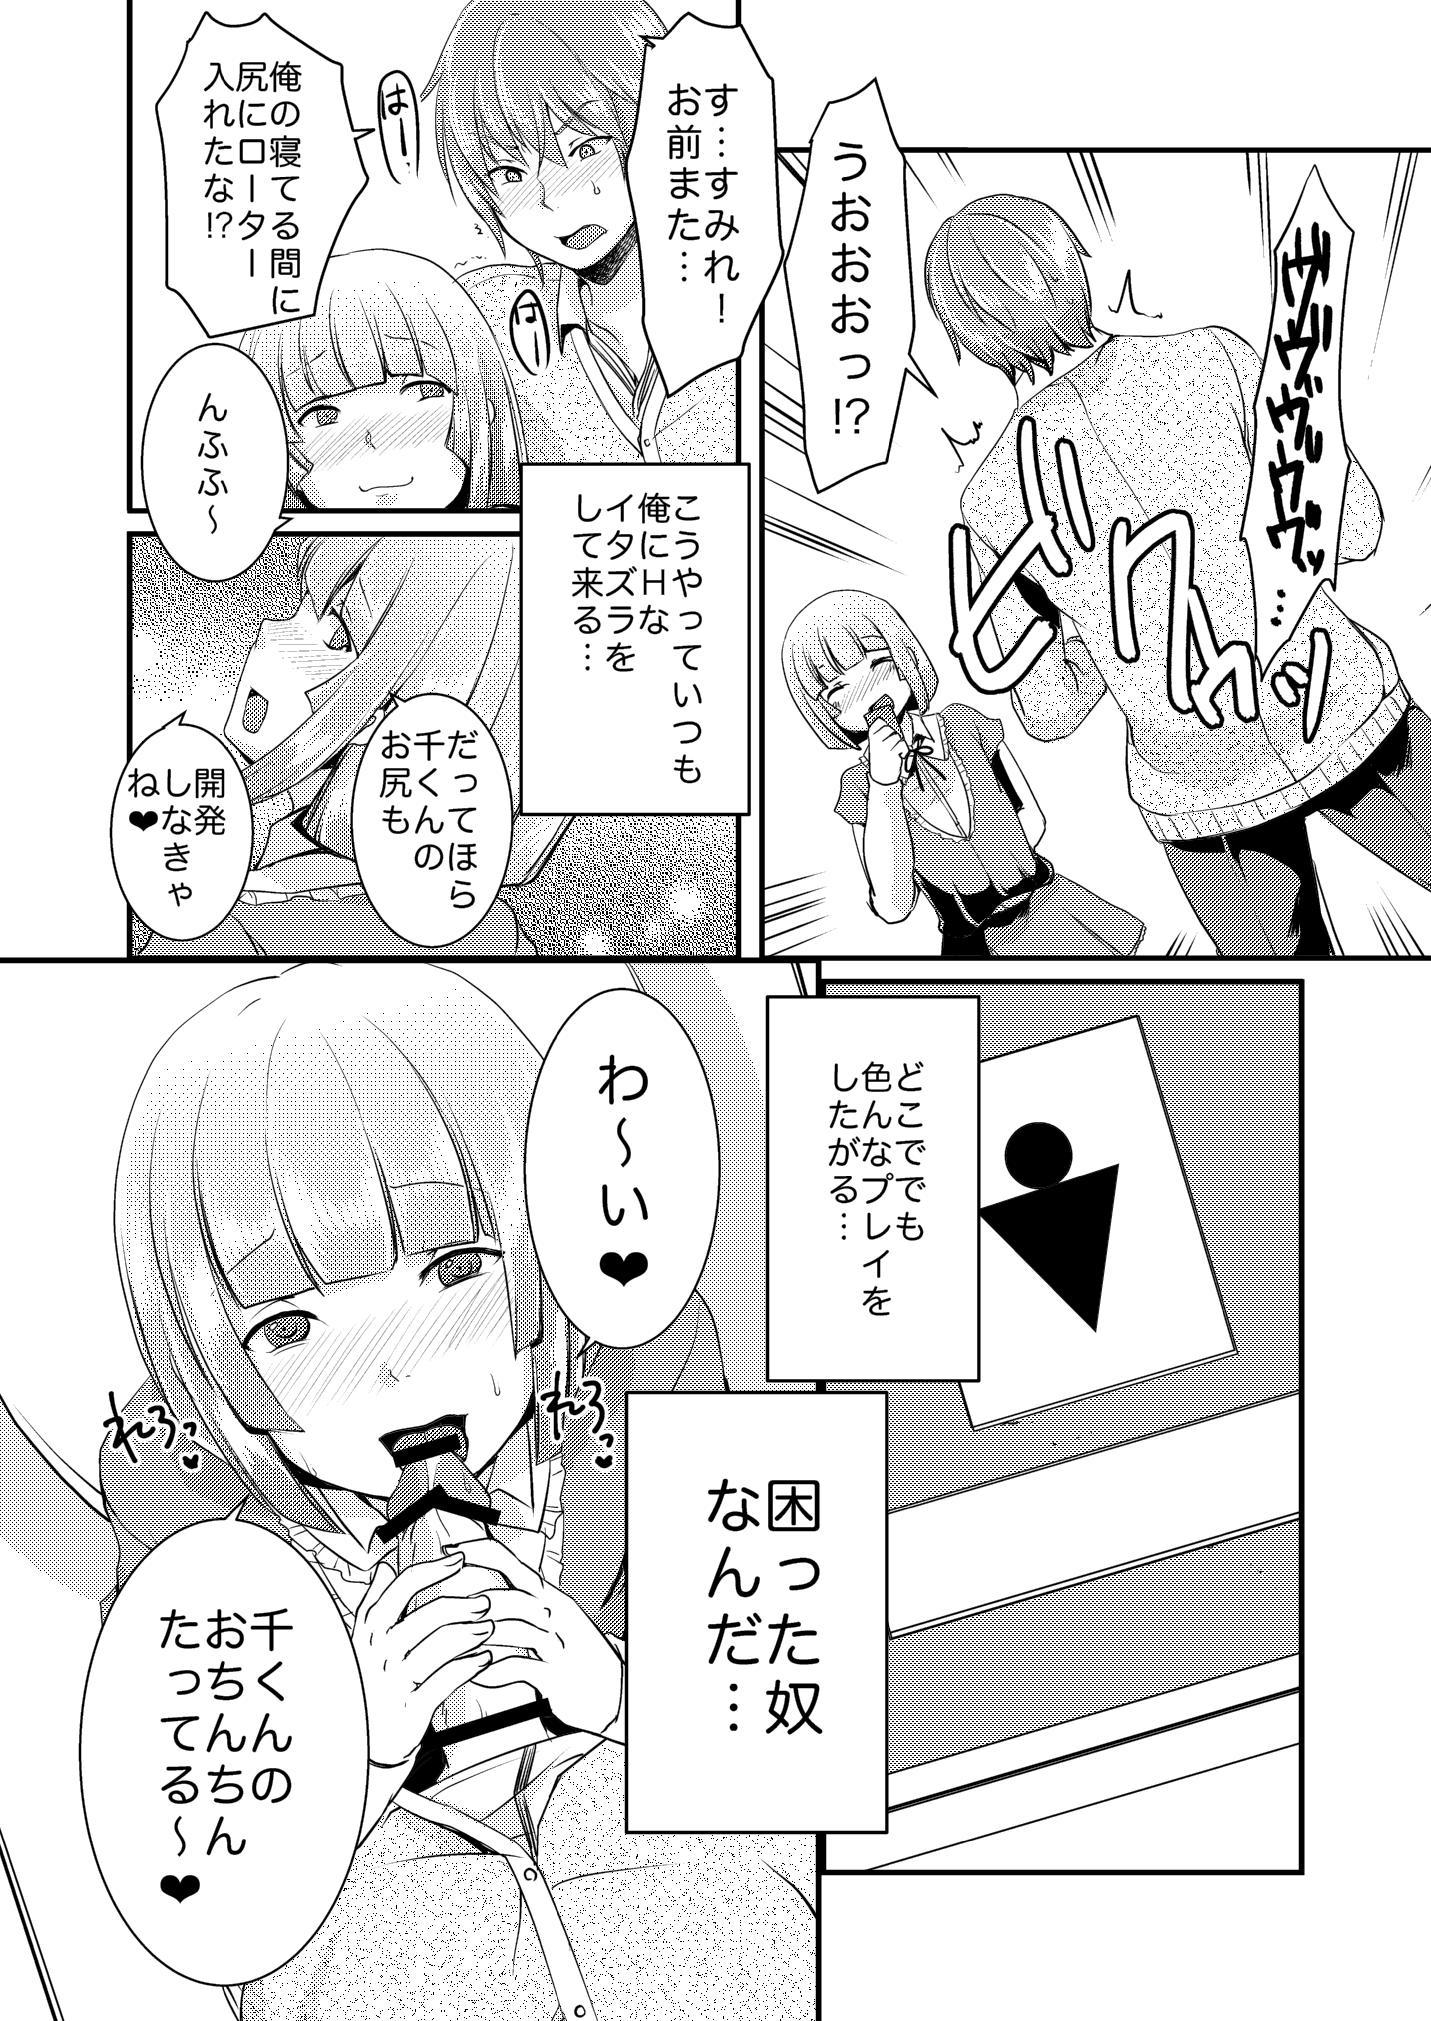 [ManbooRerere] Ore no Koibito (♂) ga Hentai Sugite… 2